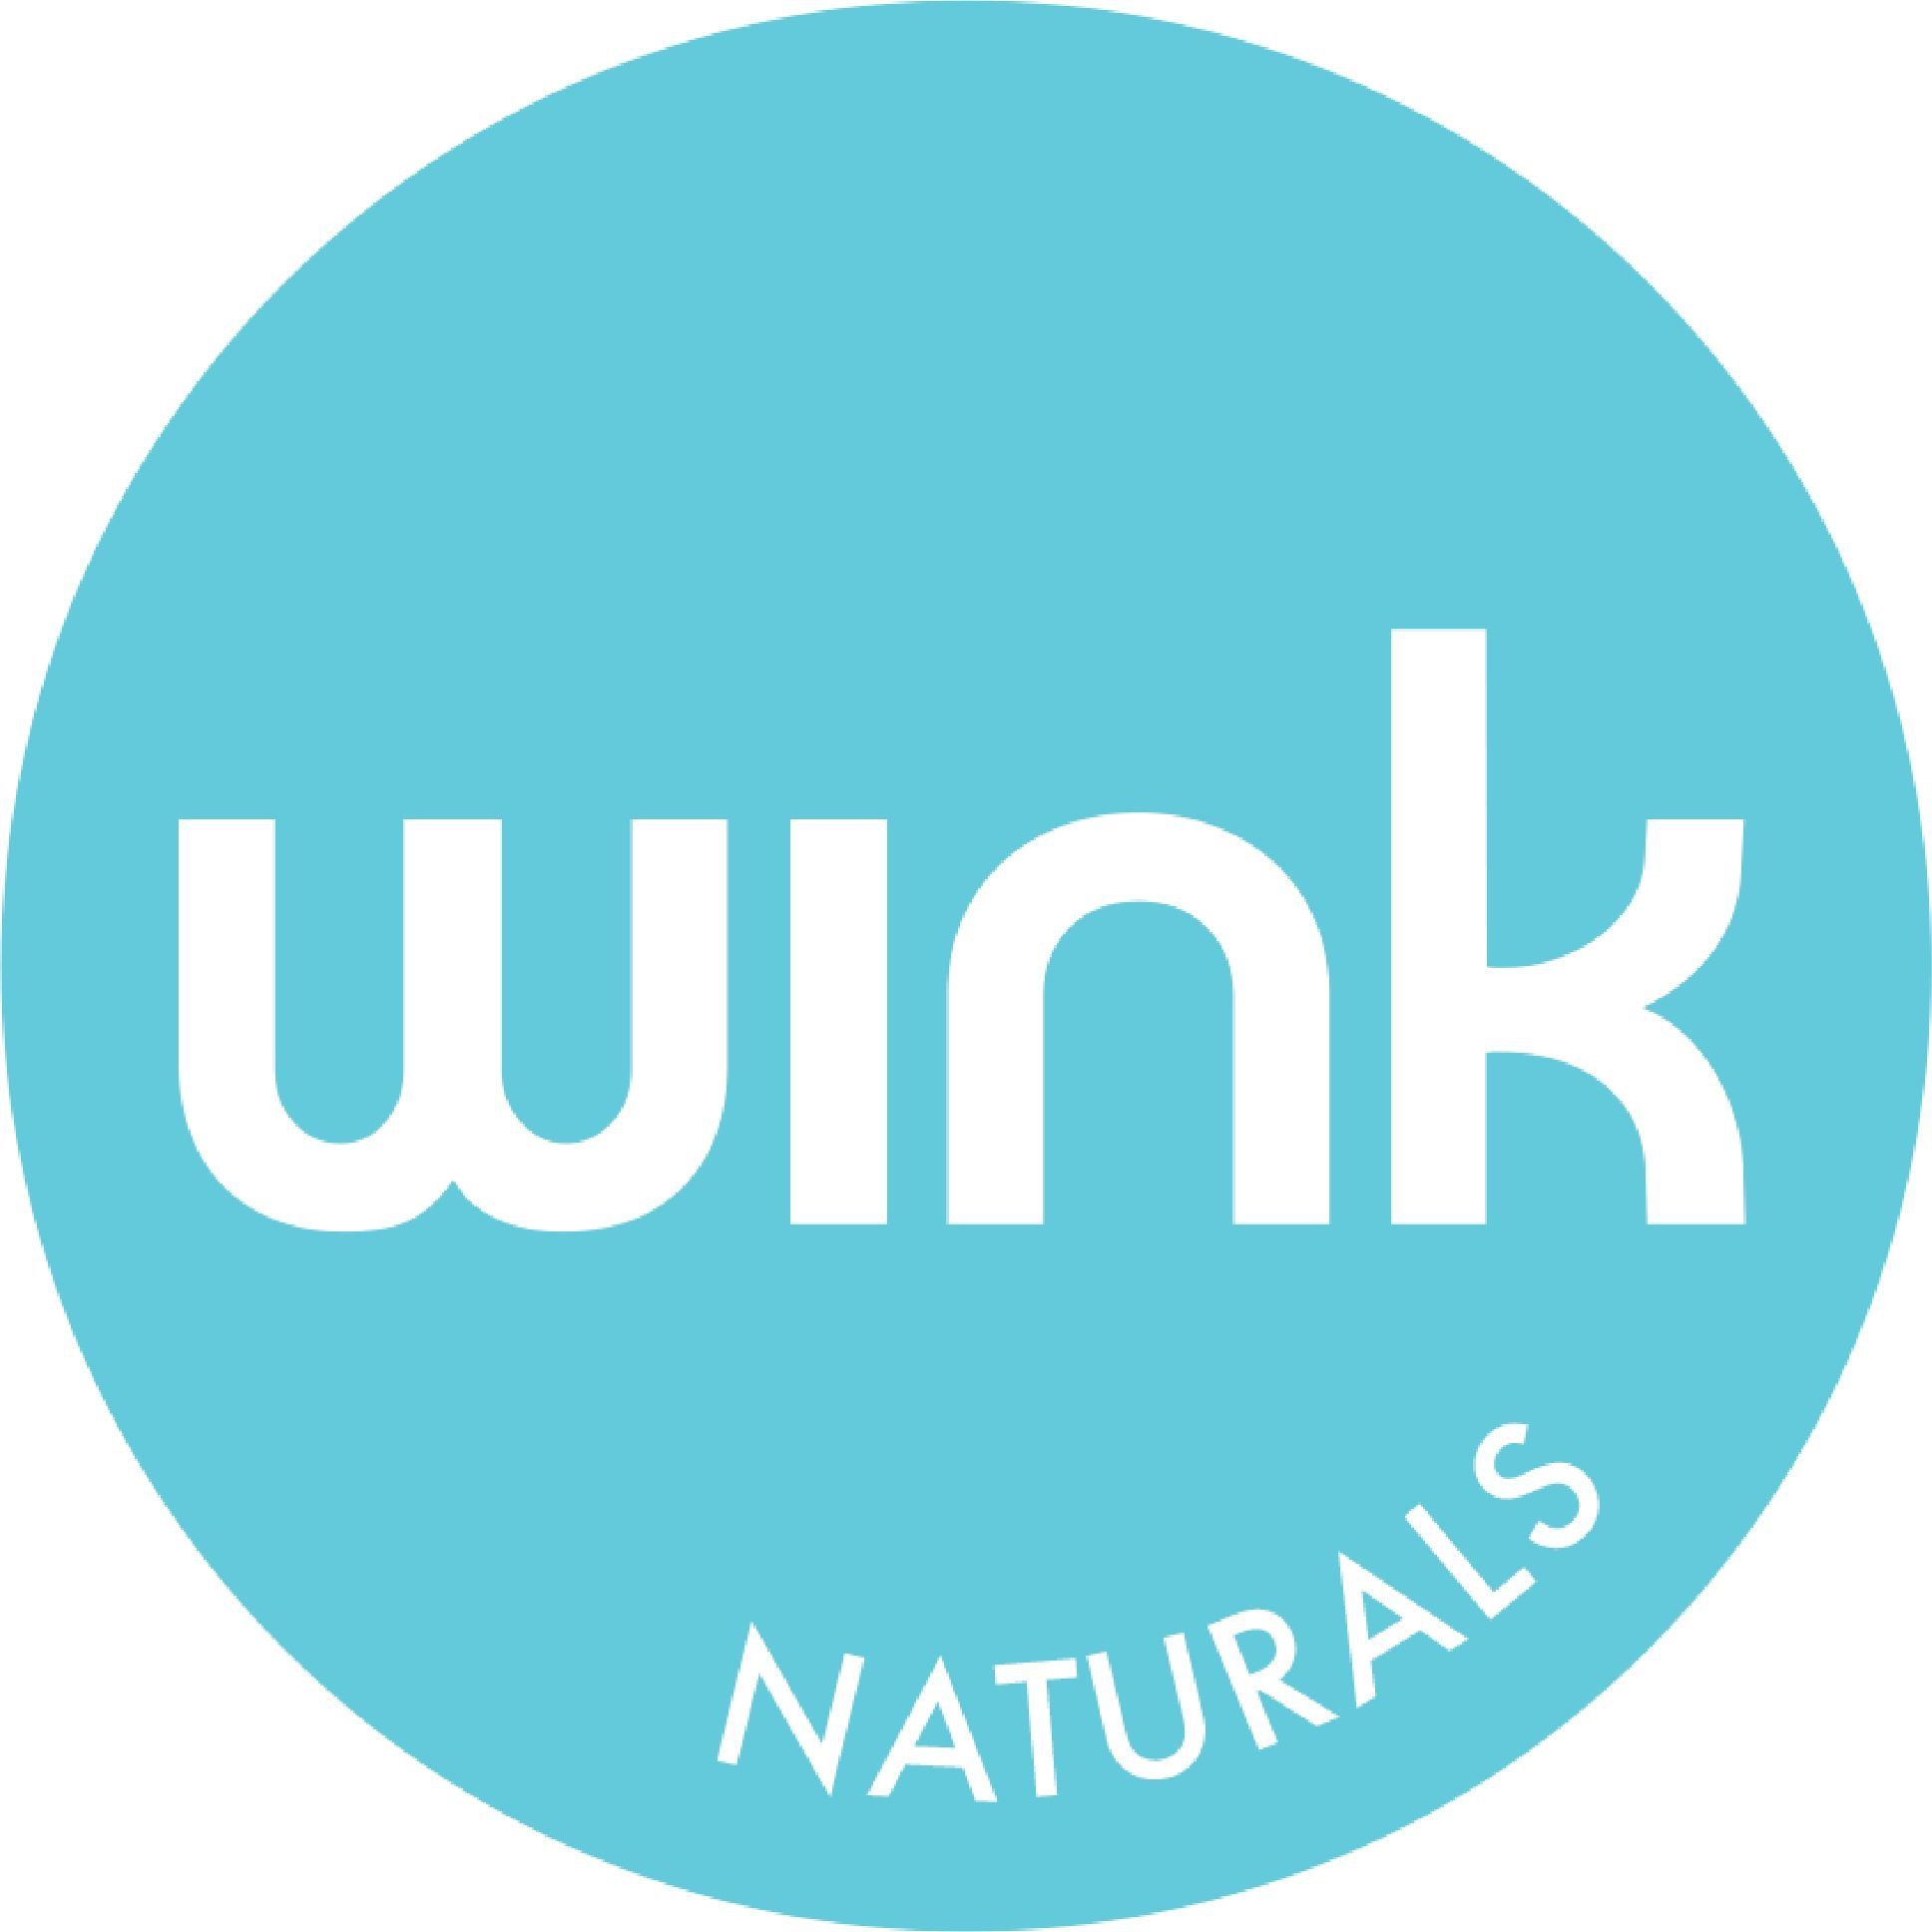 Wink Naturals Coupons & Promo codes